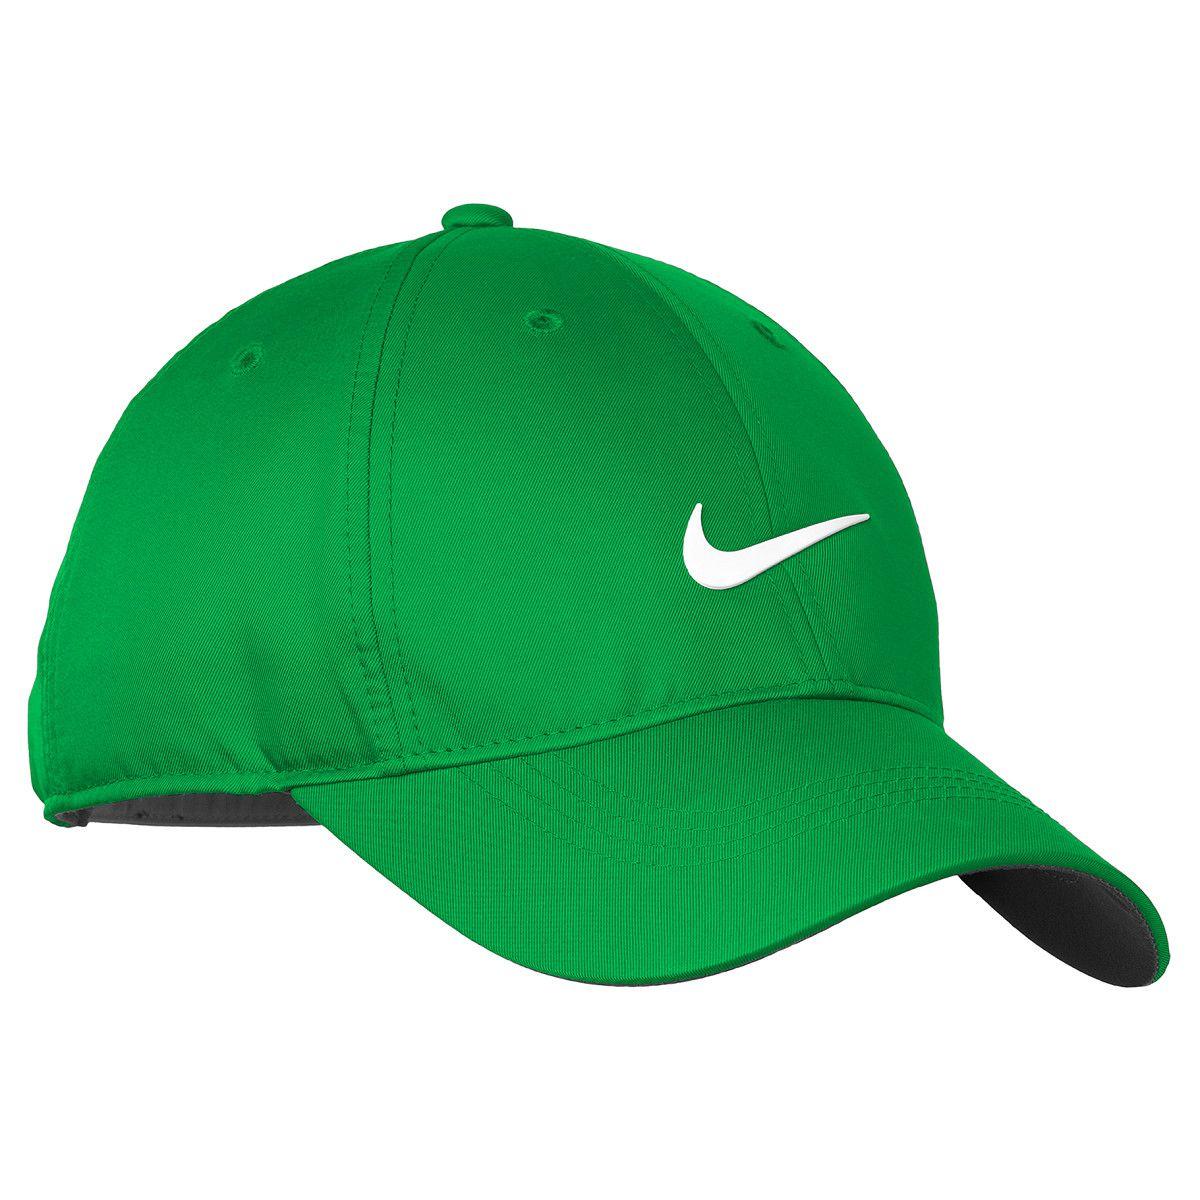 5eb5c9021 Nike 548533 Dri-FIT Swoosh Front Cap - Lucky Green/White | Nike Golf ...